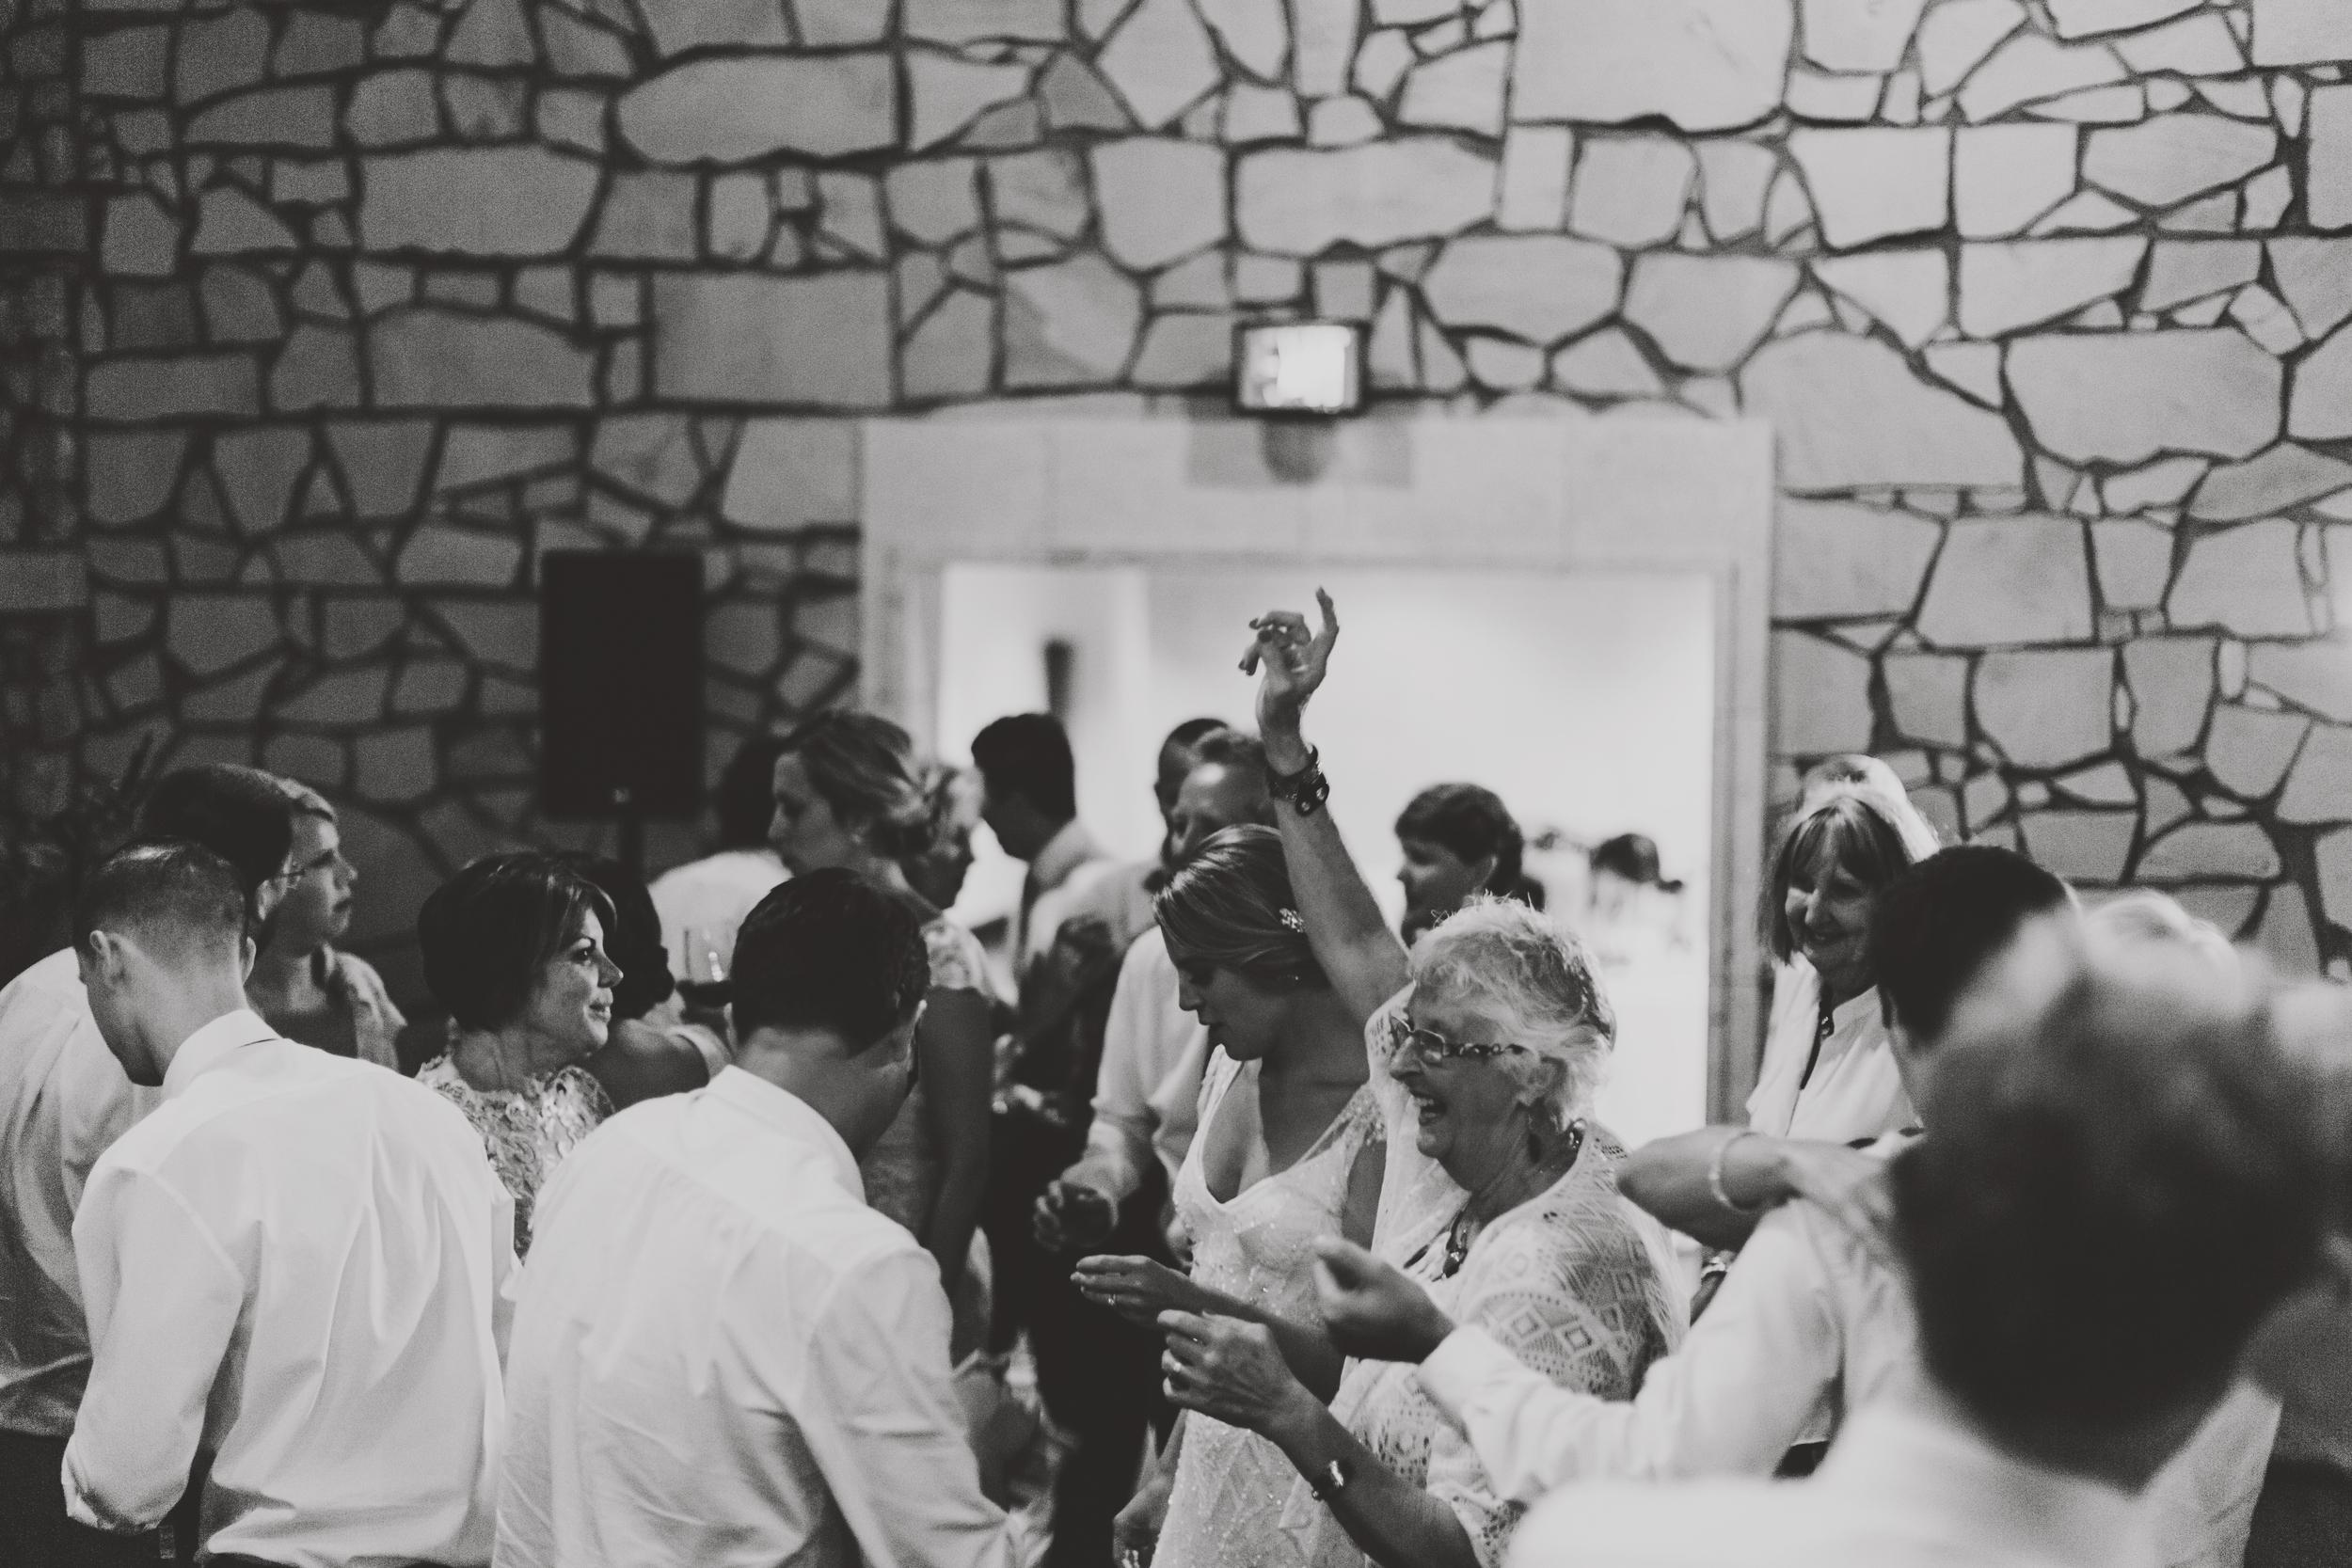 angie-diaz-photography-maui-wedding-mel-matt-112.jpg